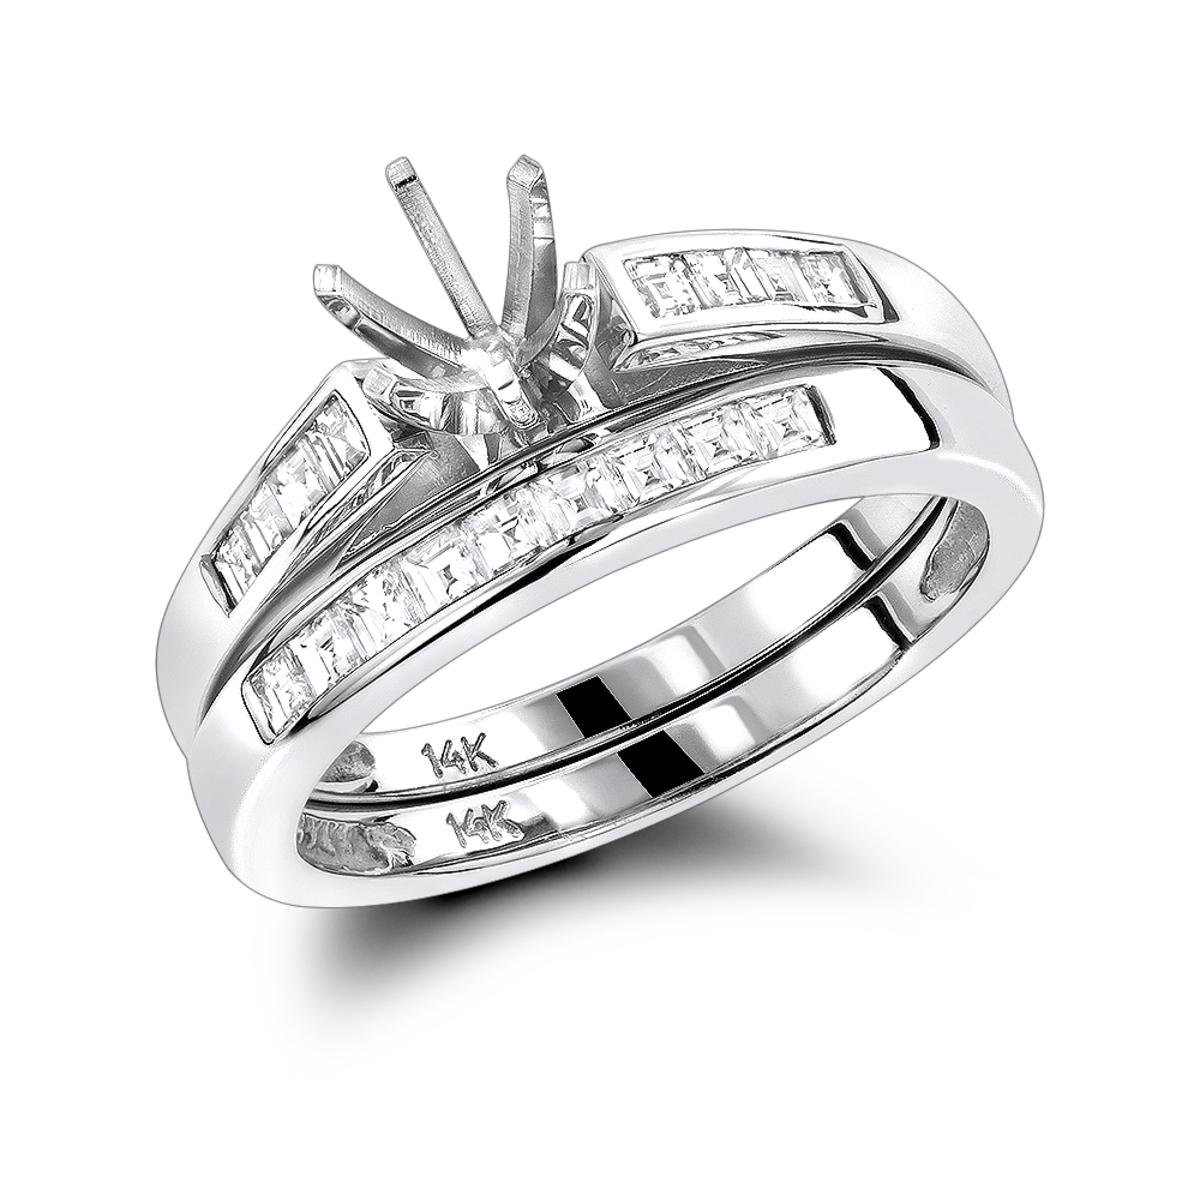 14K Gold Diamond Designer Engagement Ring Set 0.57ct